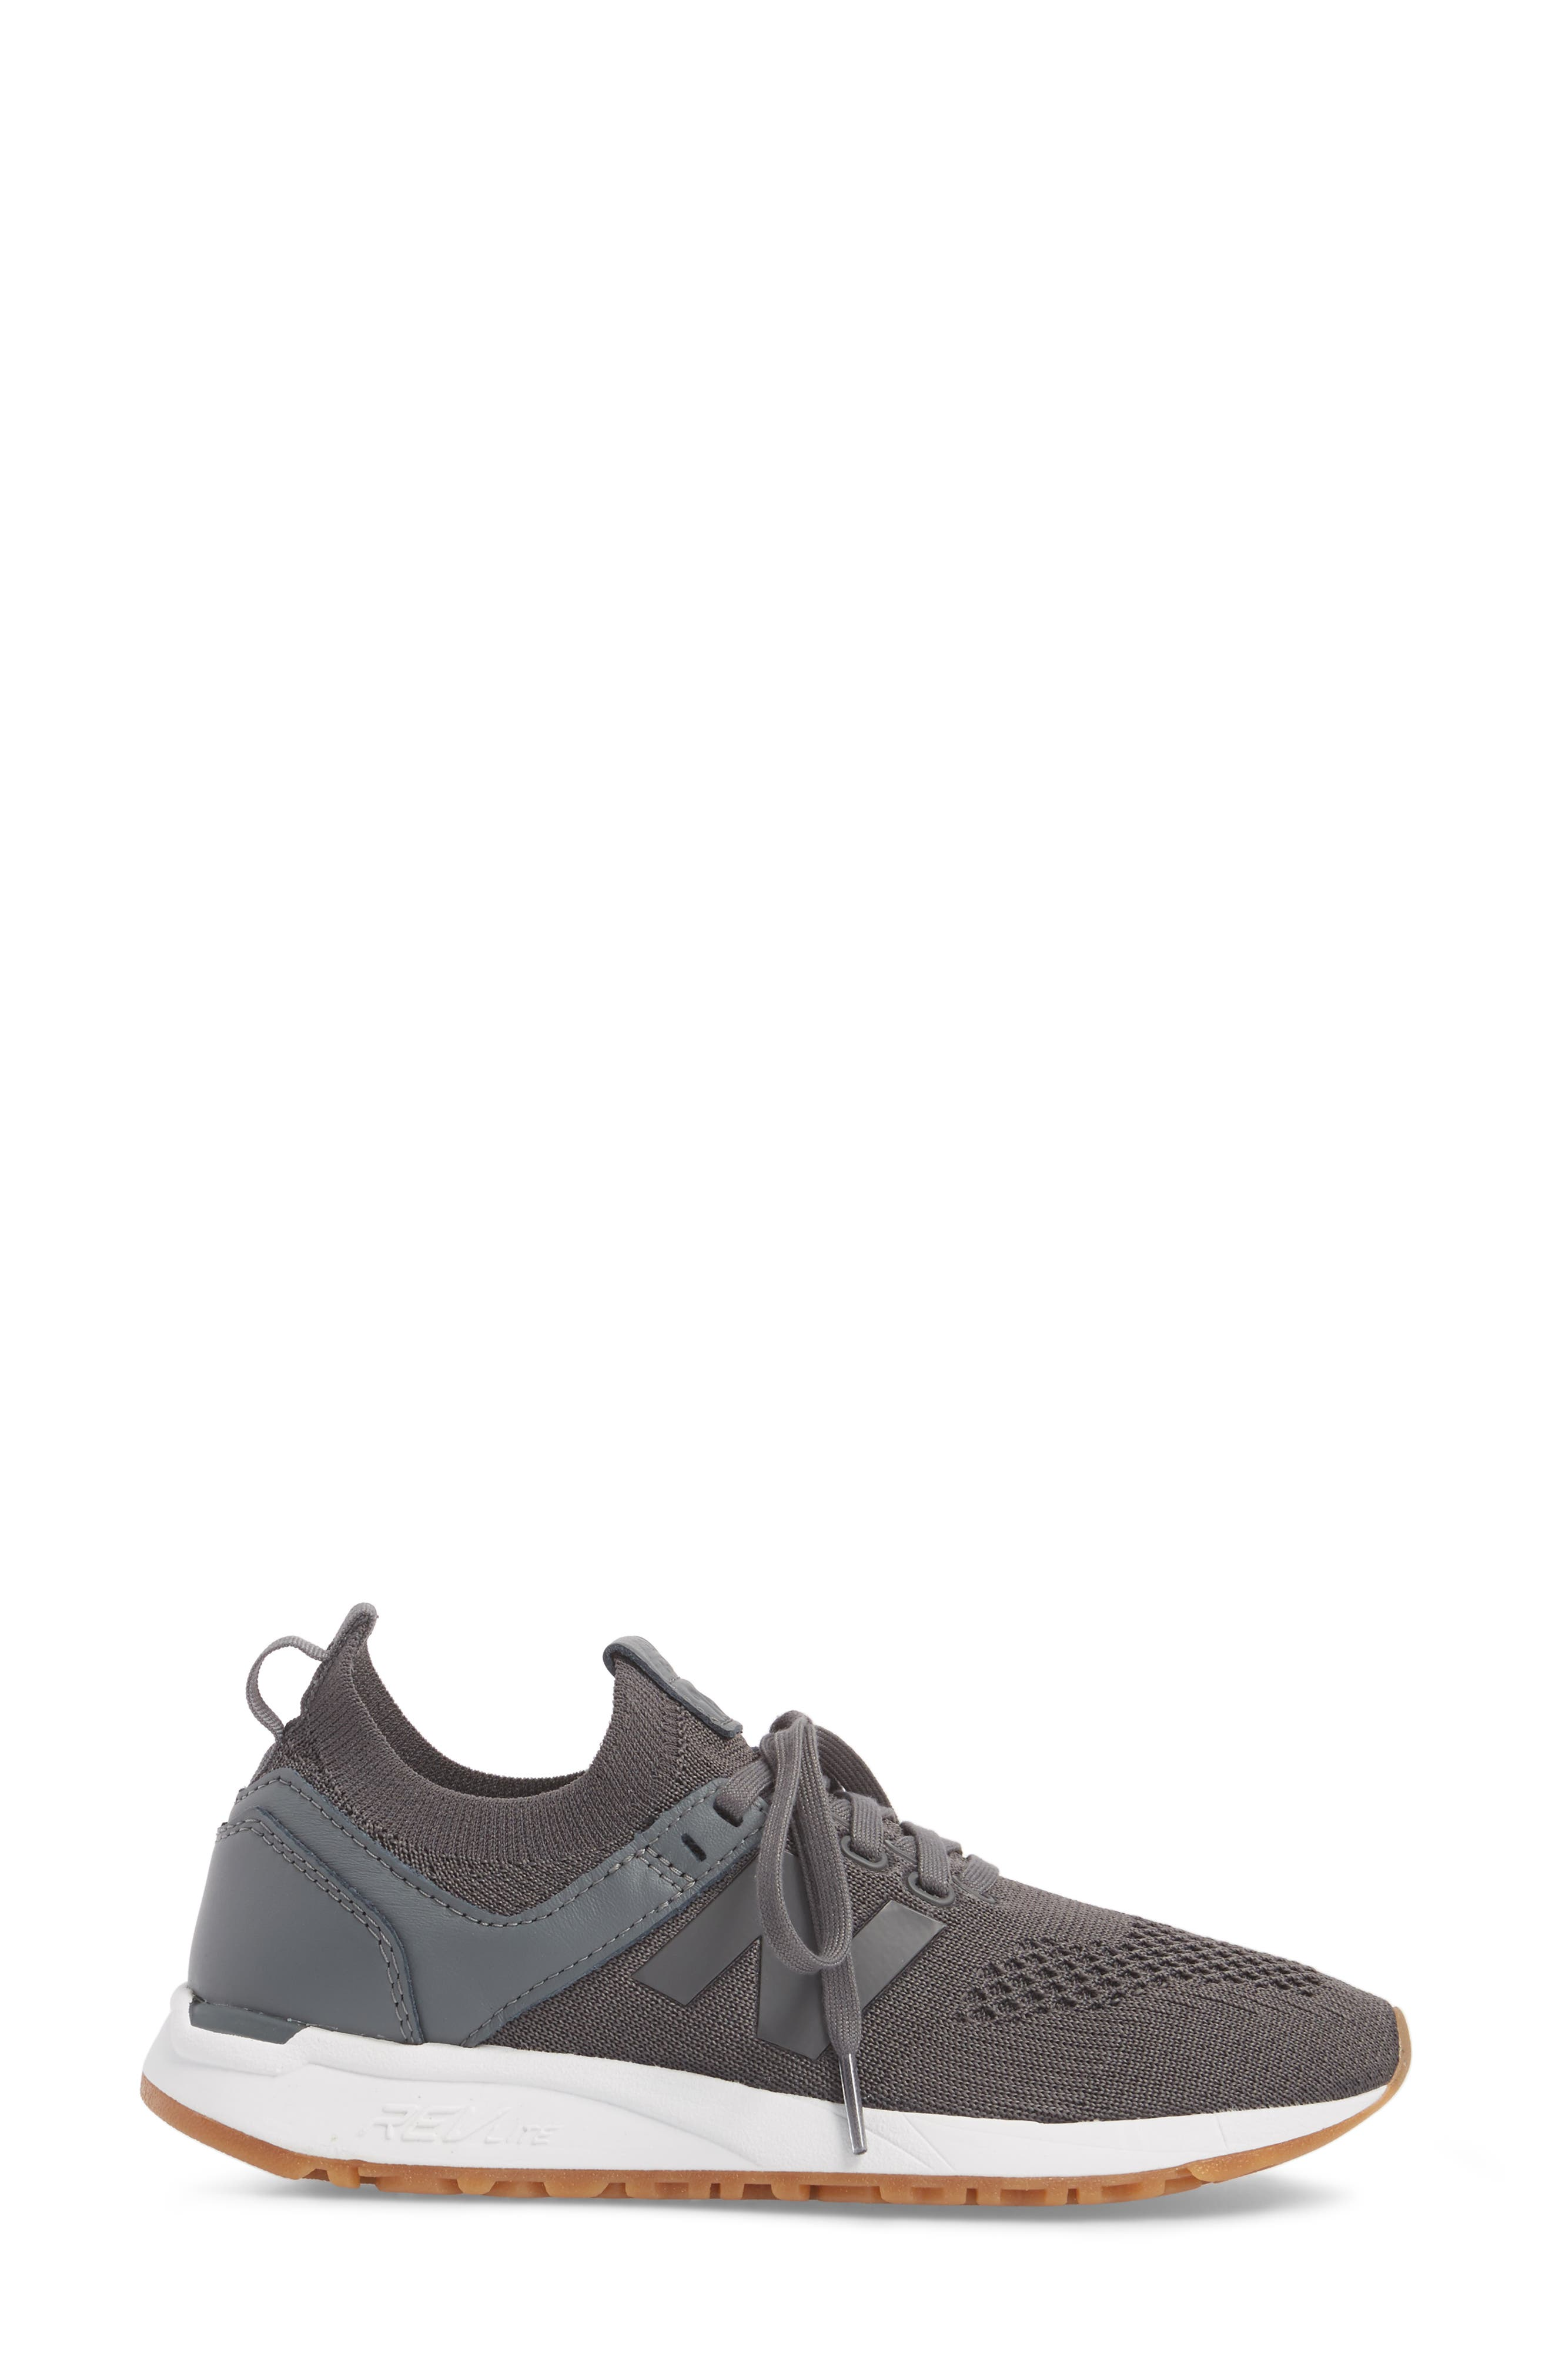 247 Decon Knit Sneaker,                             Alternate thumbnail 3, color,                             030